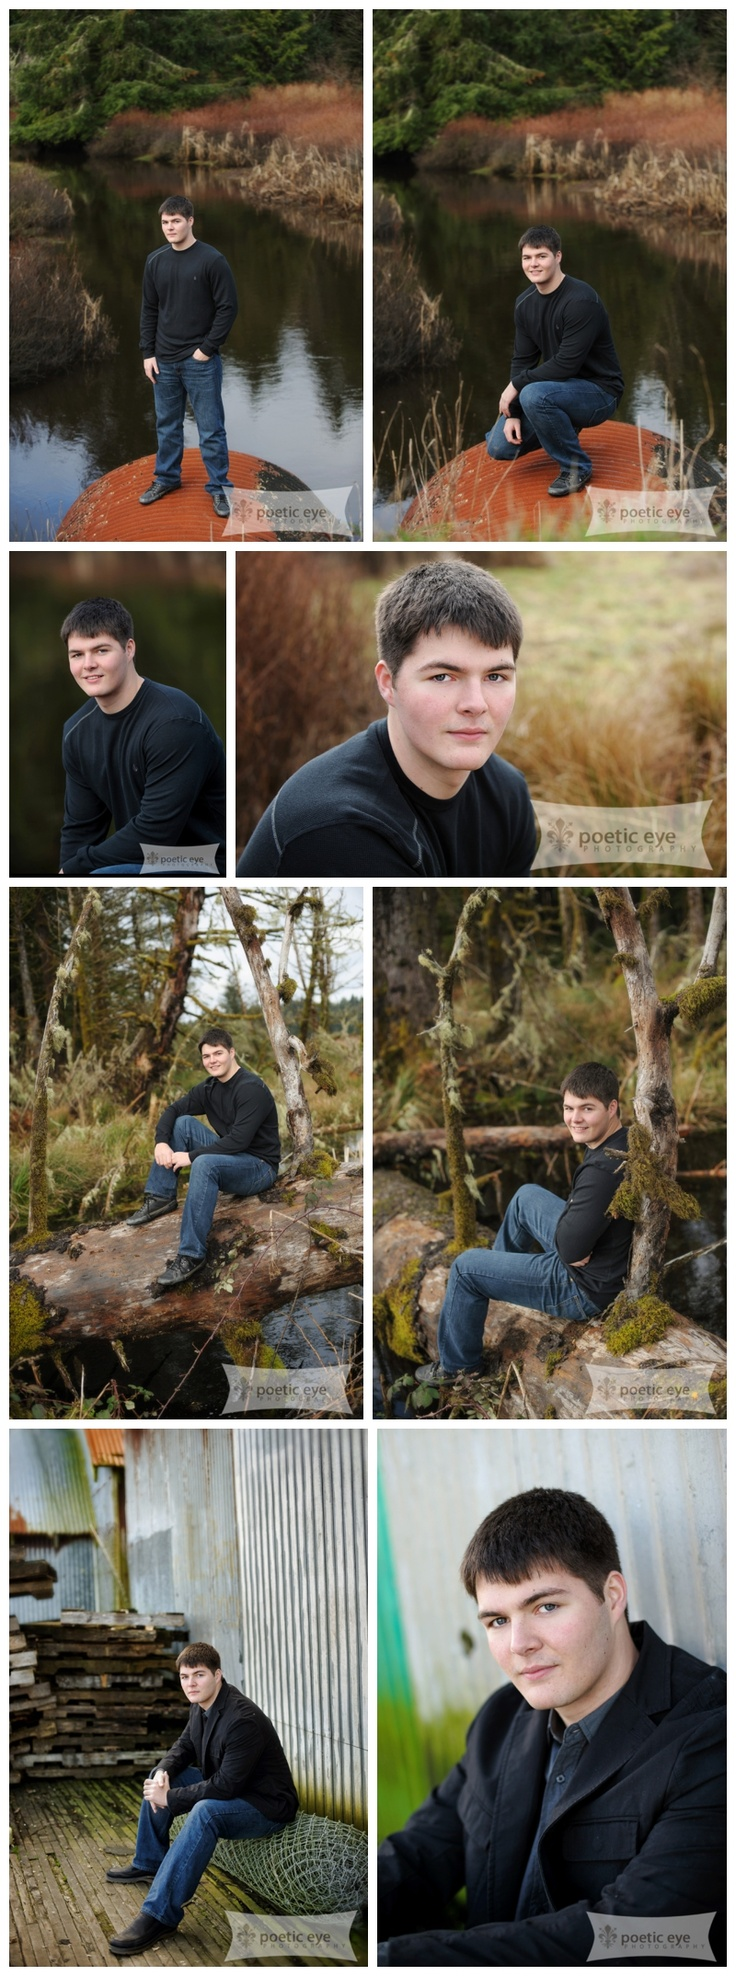 poeticeyephotography.com High School Senior Guy pictures poses